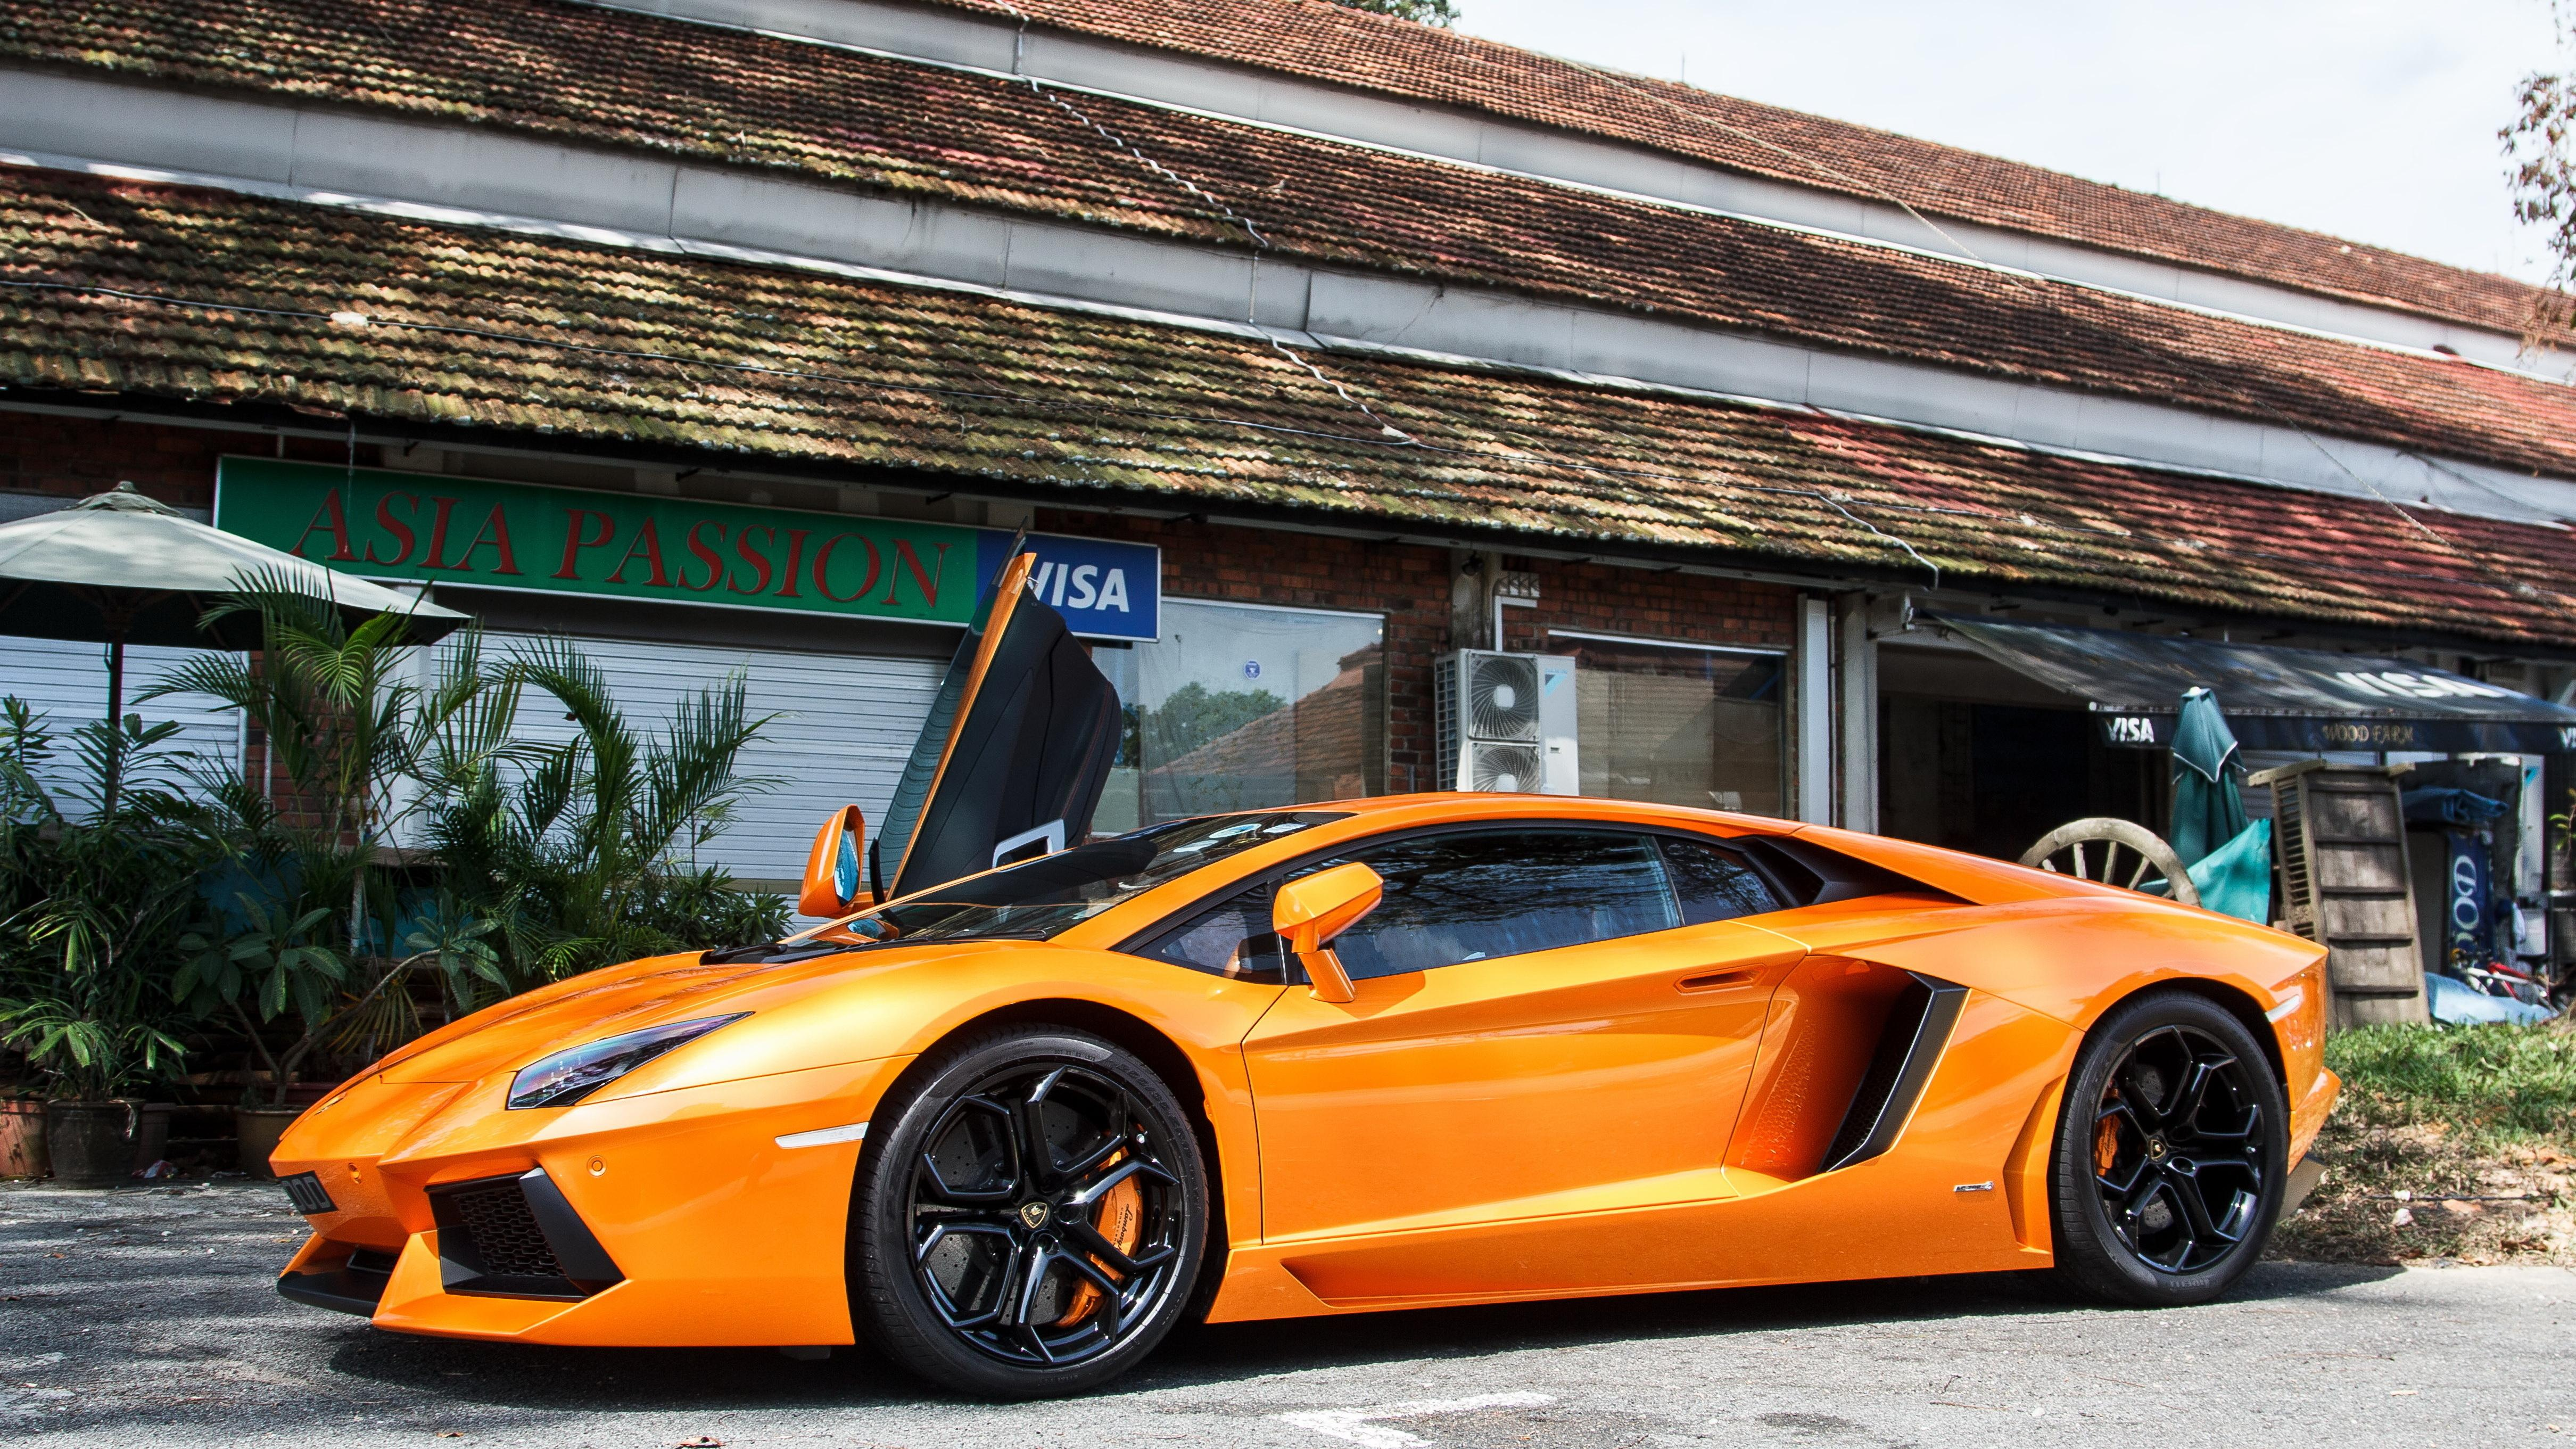 ultra hd car wallpapers,land vehicle,vehicle,car,supercar,sports car